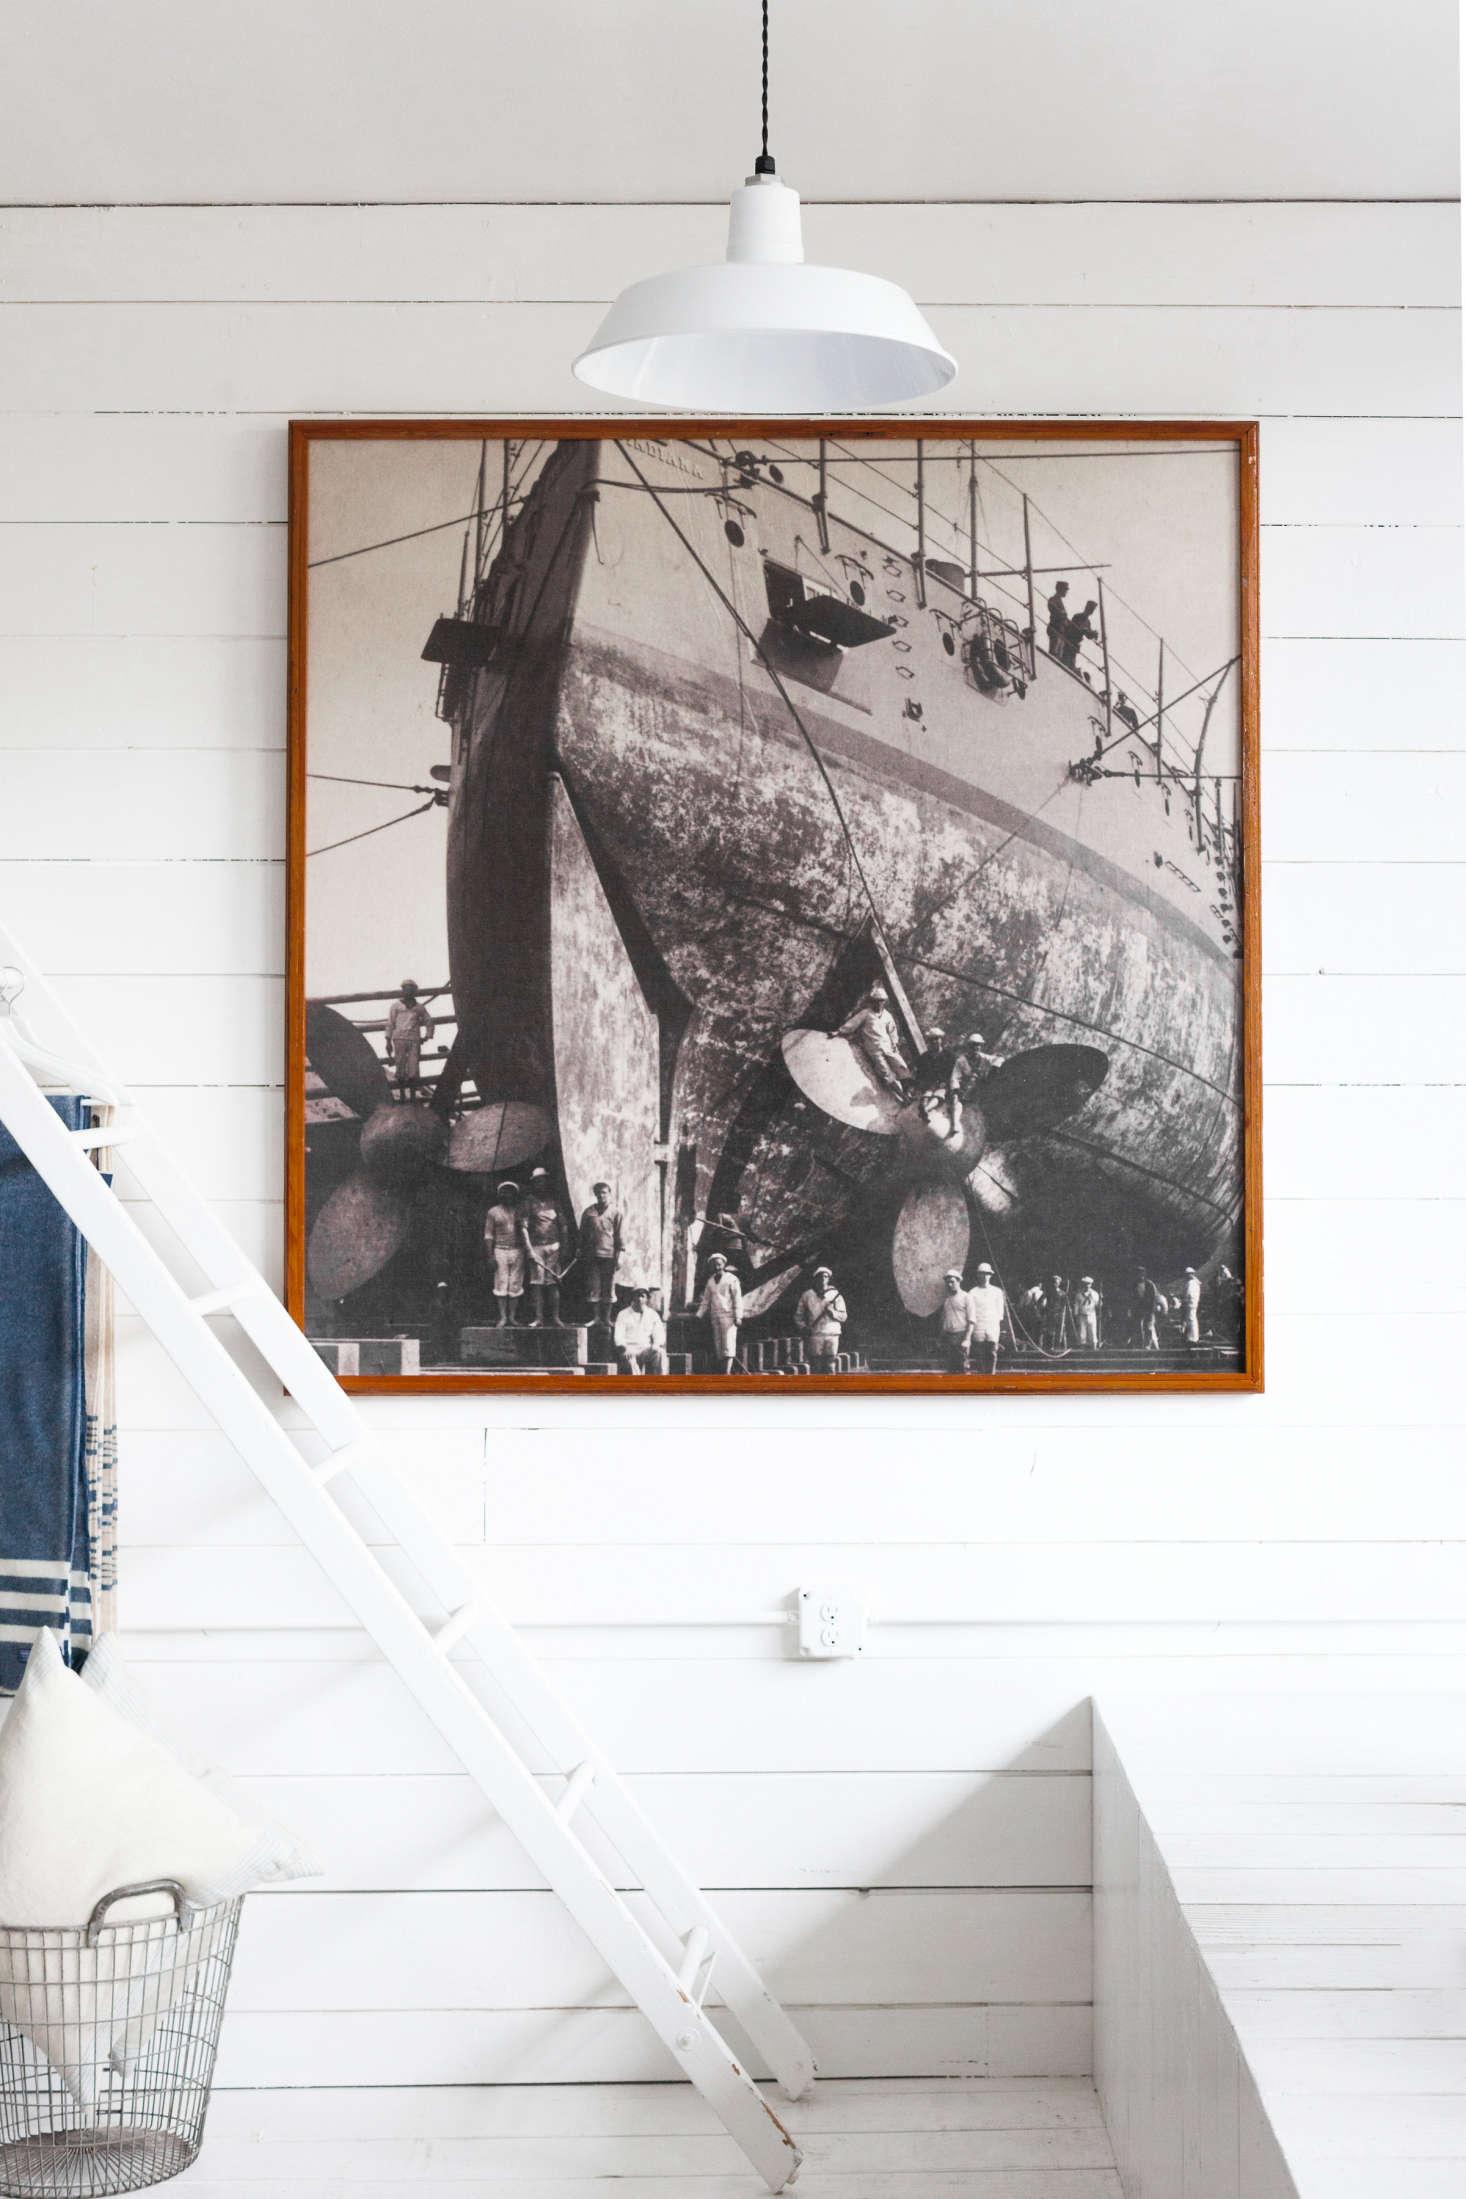 An antique photo of a shipbuilding scene sets the subtle nautical theme of the shop.